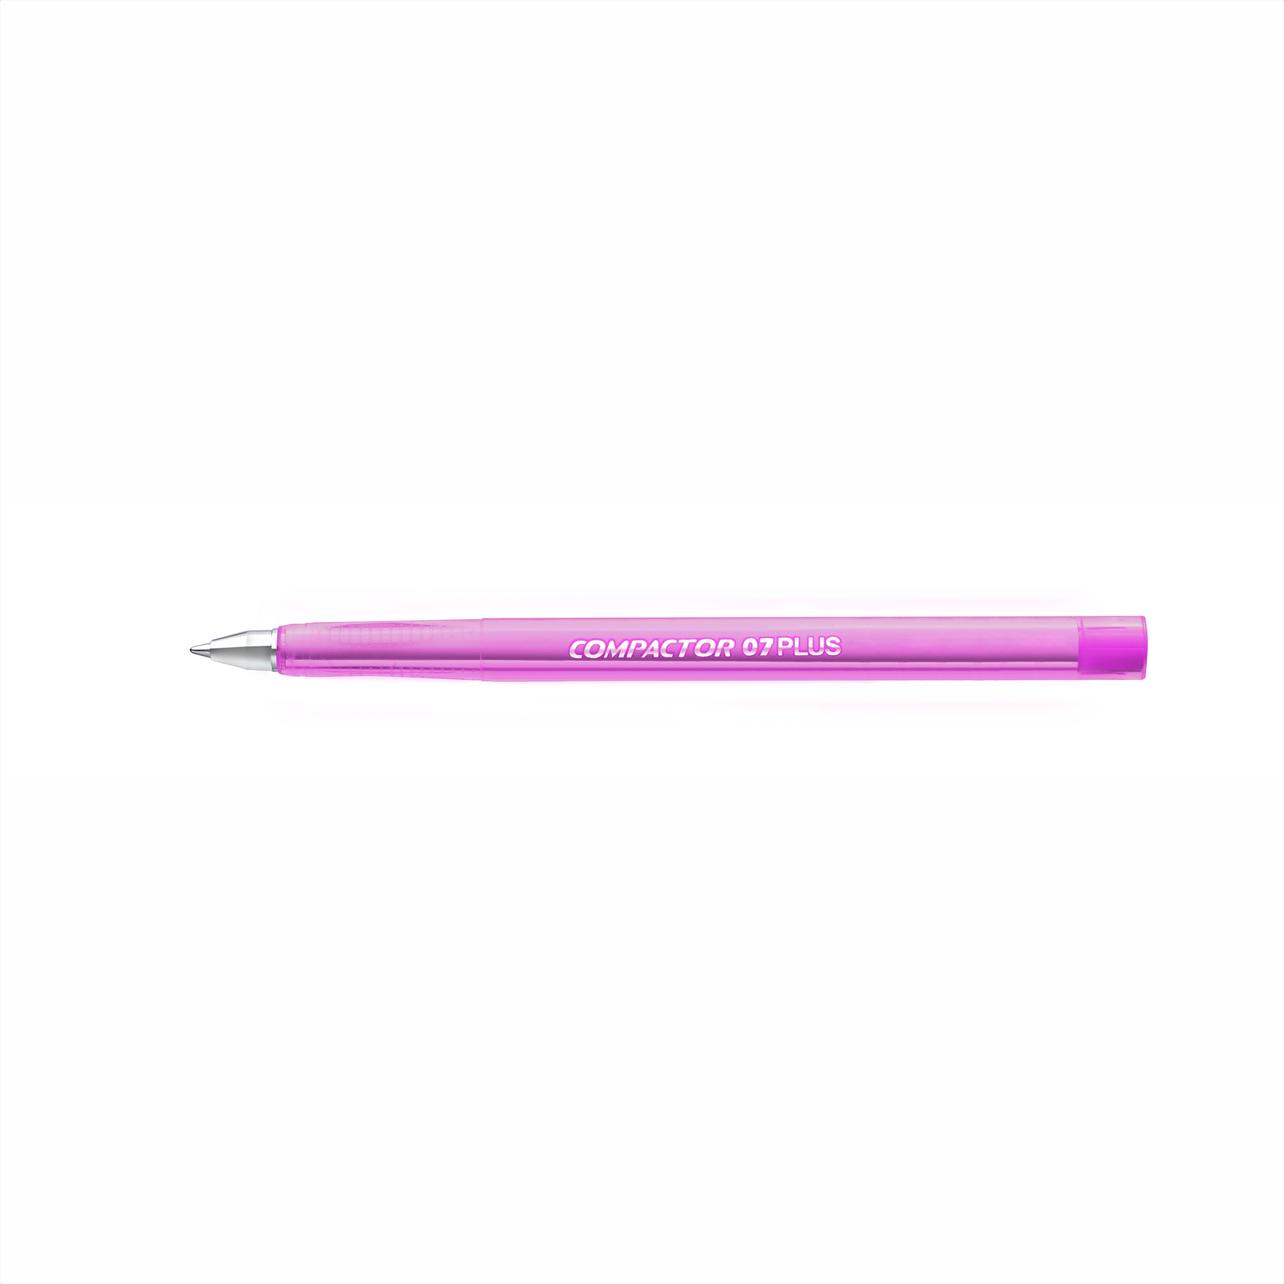 Caneta esferográfica 0.7 rosa PLUS Compactor